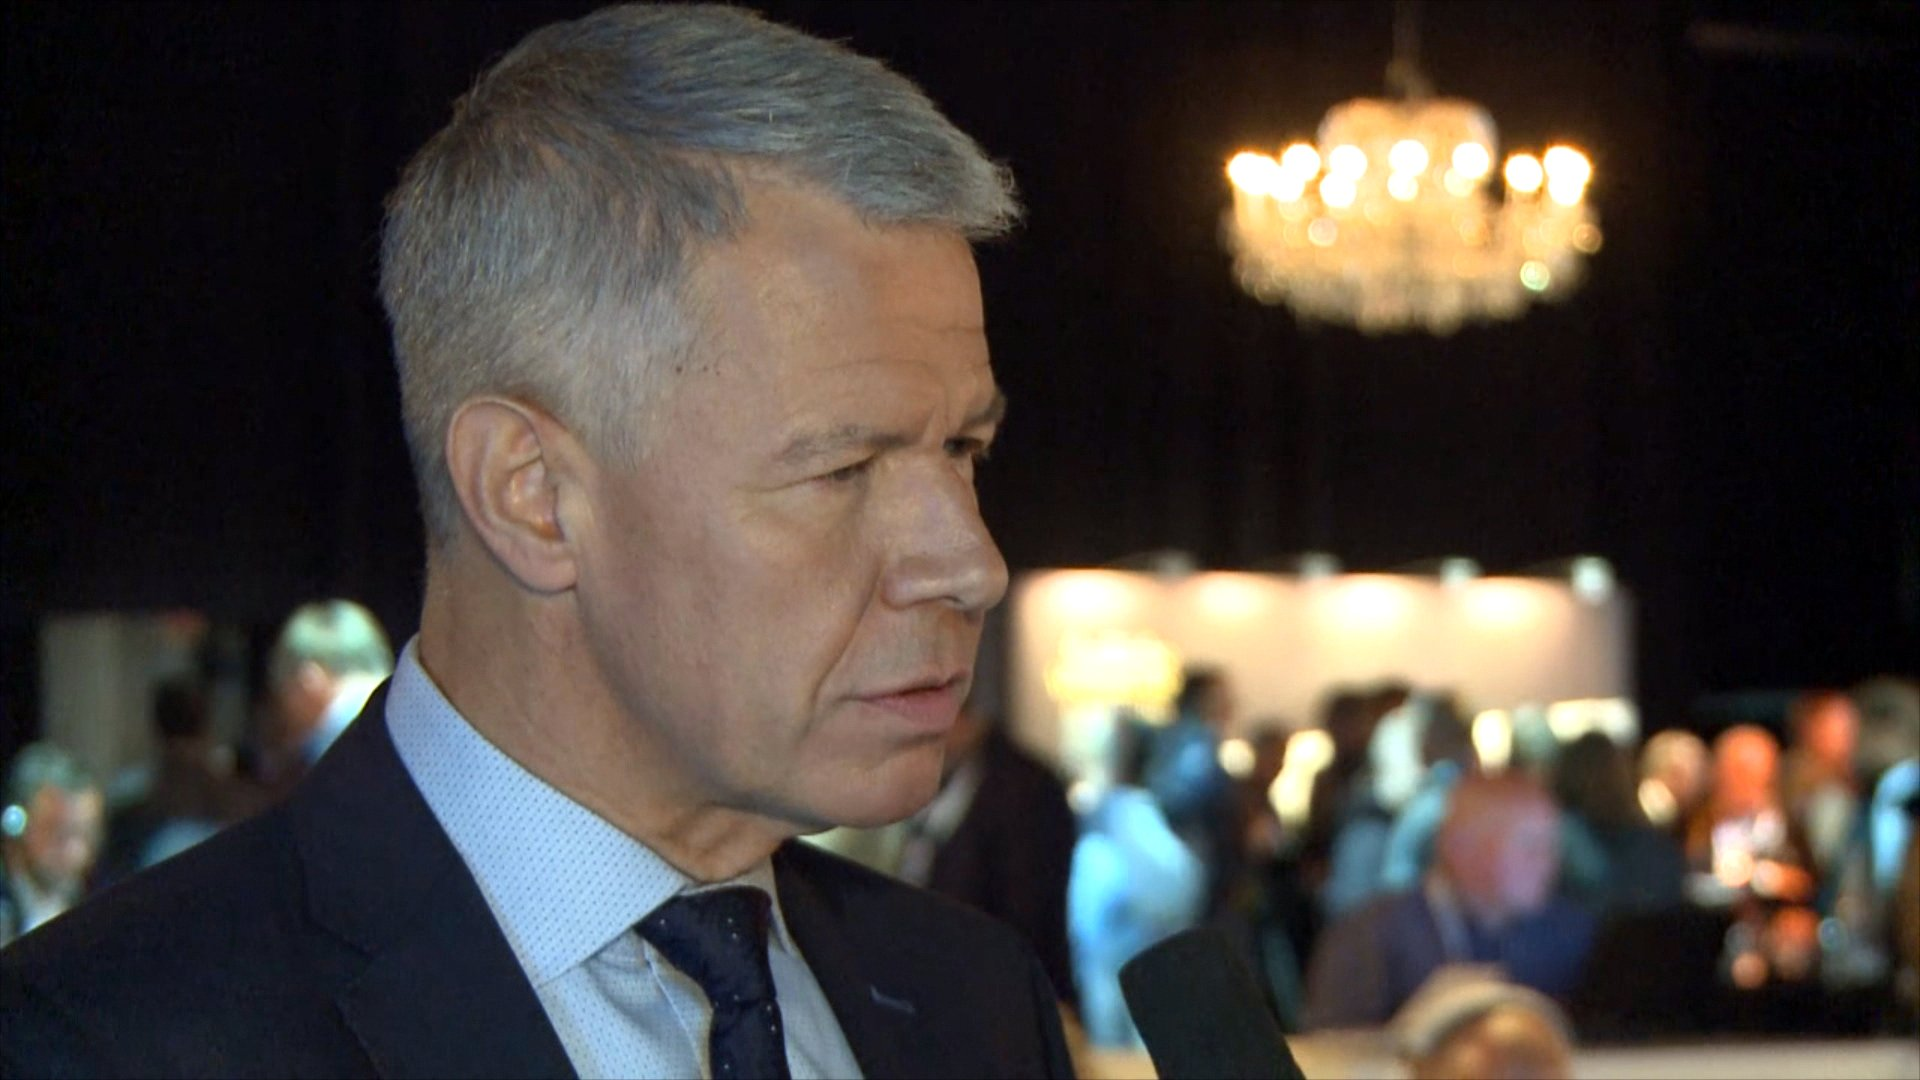 """Zwei Duelle wären schöner gewesen"" – Peter Kloeppel zum TV-Duell"